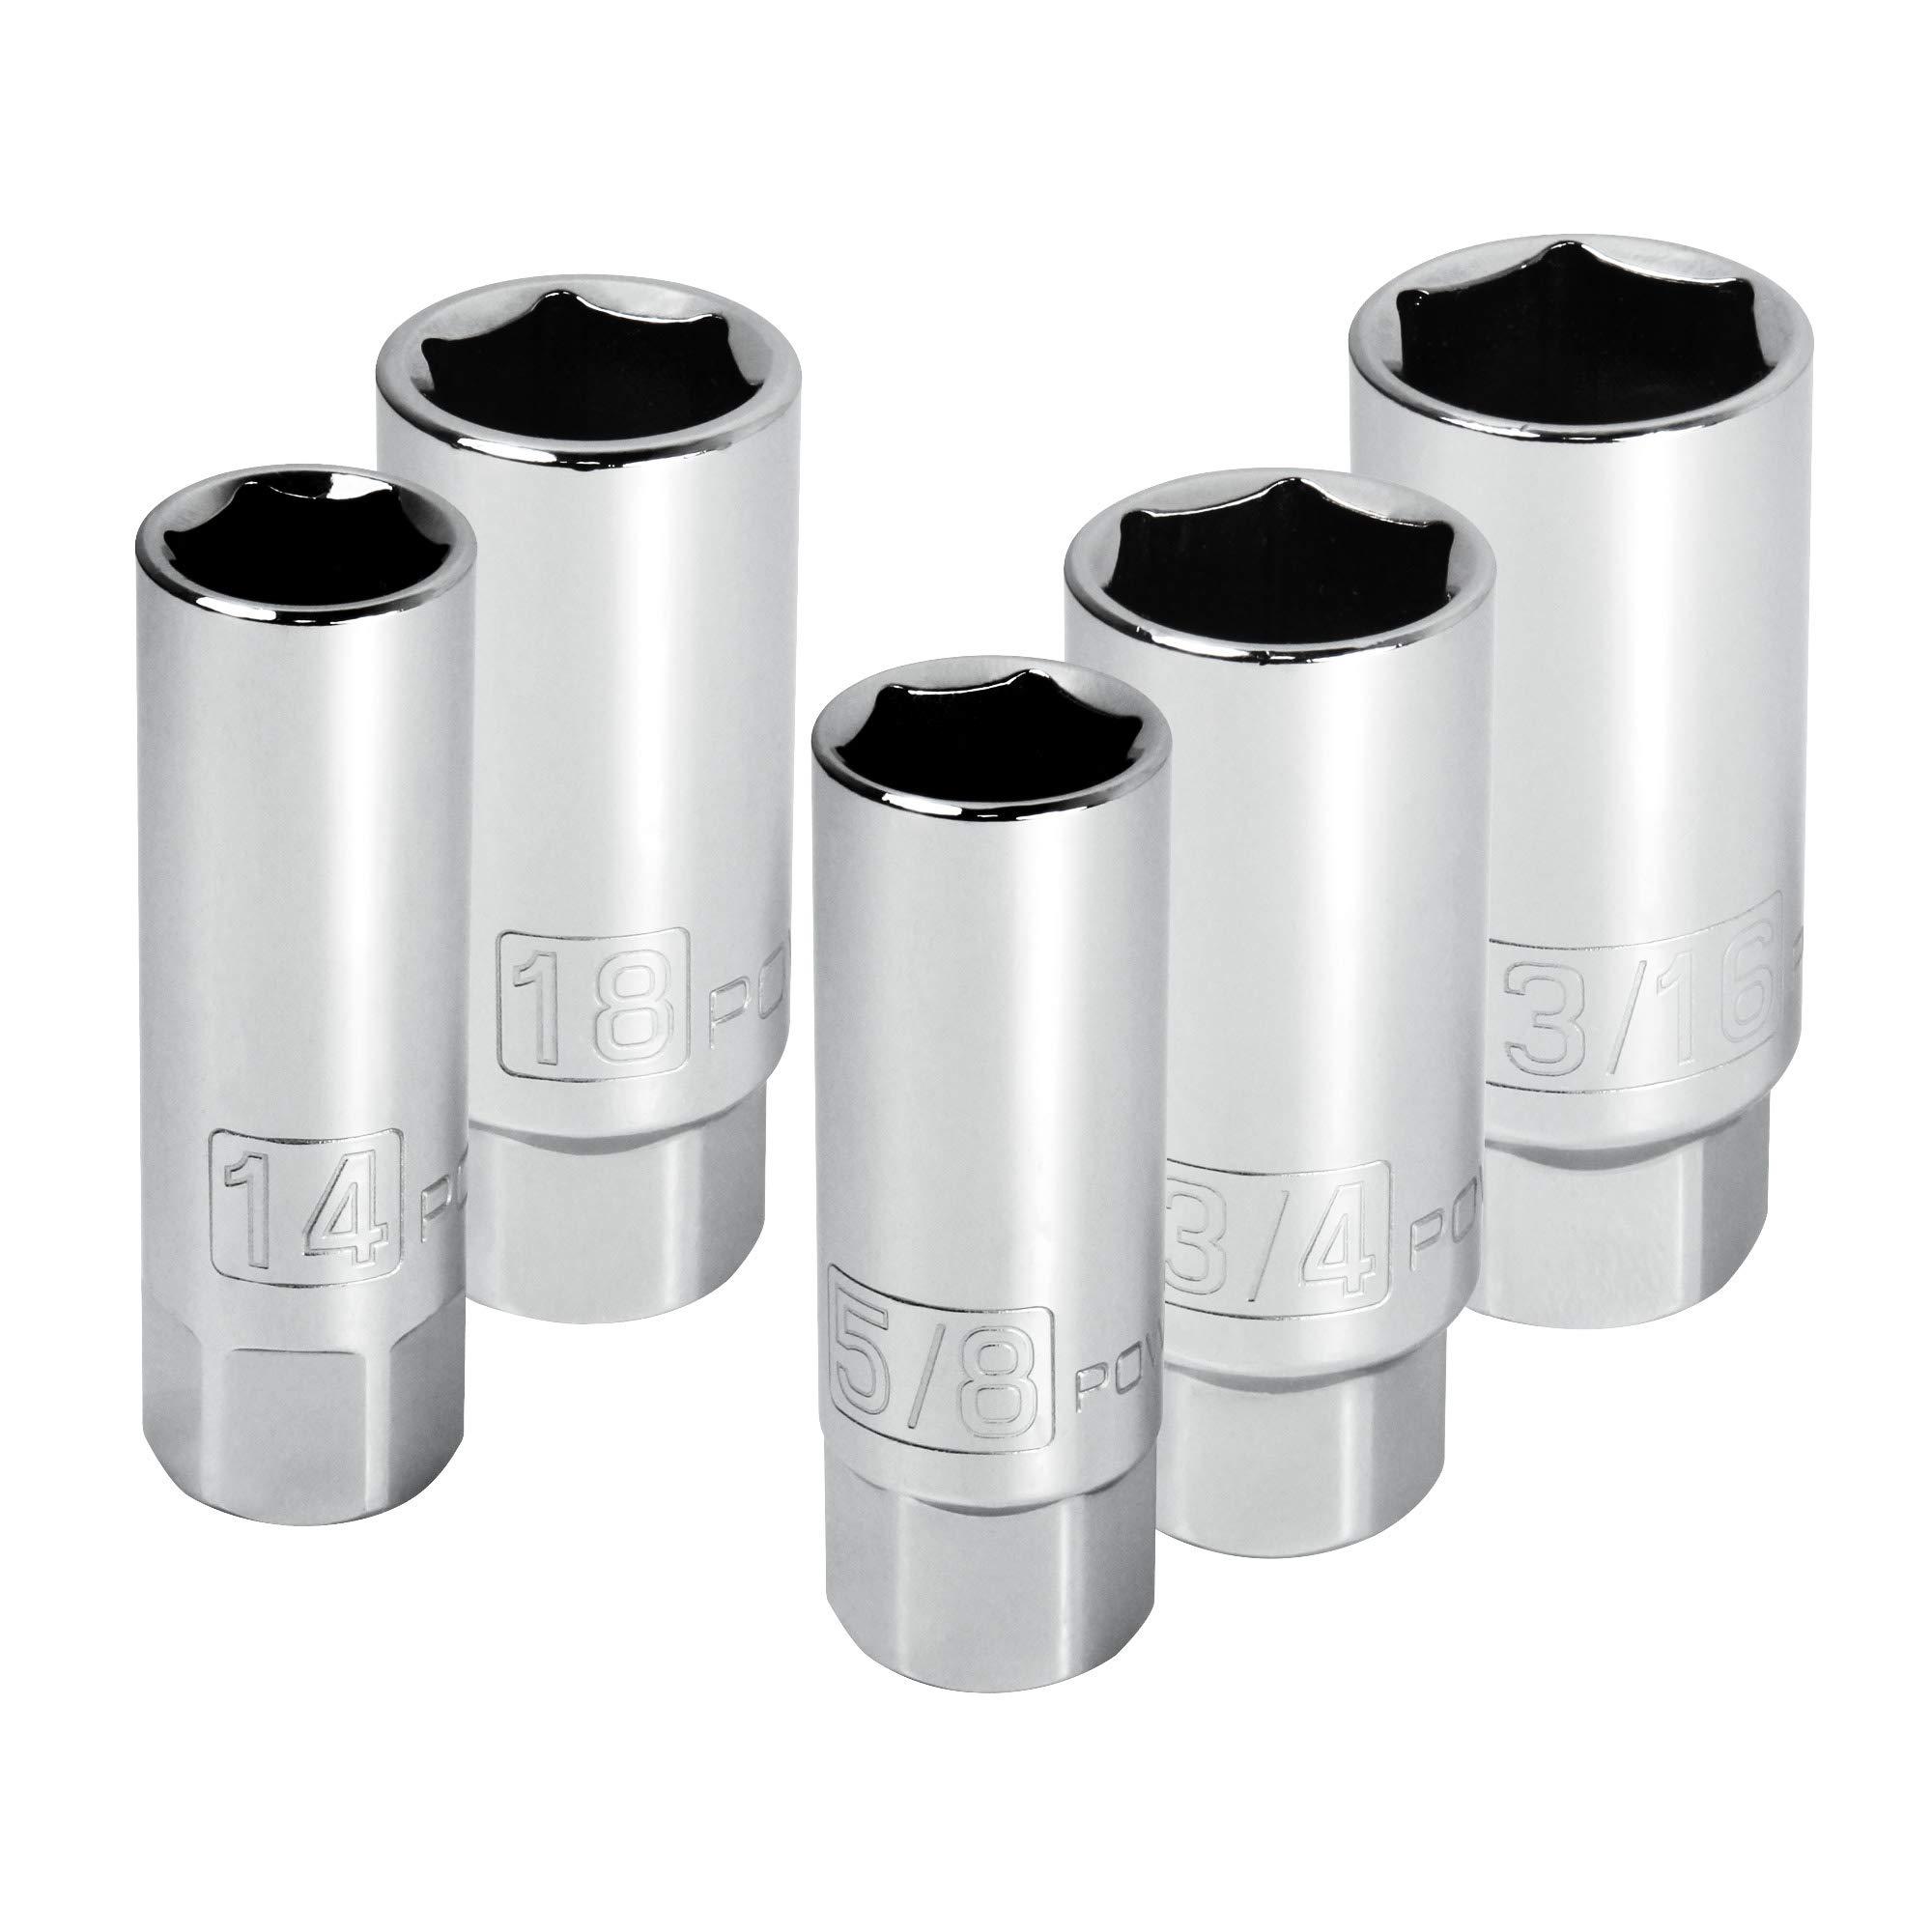 Powerbuilt 640855 3/8-Inch Drive Spark Plug Socket Set, 5-Piece , Grey